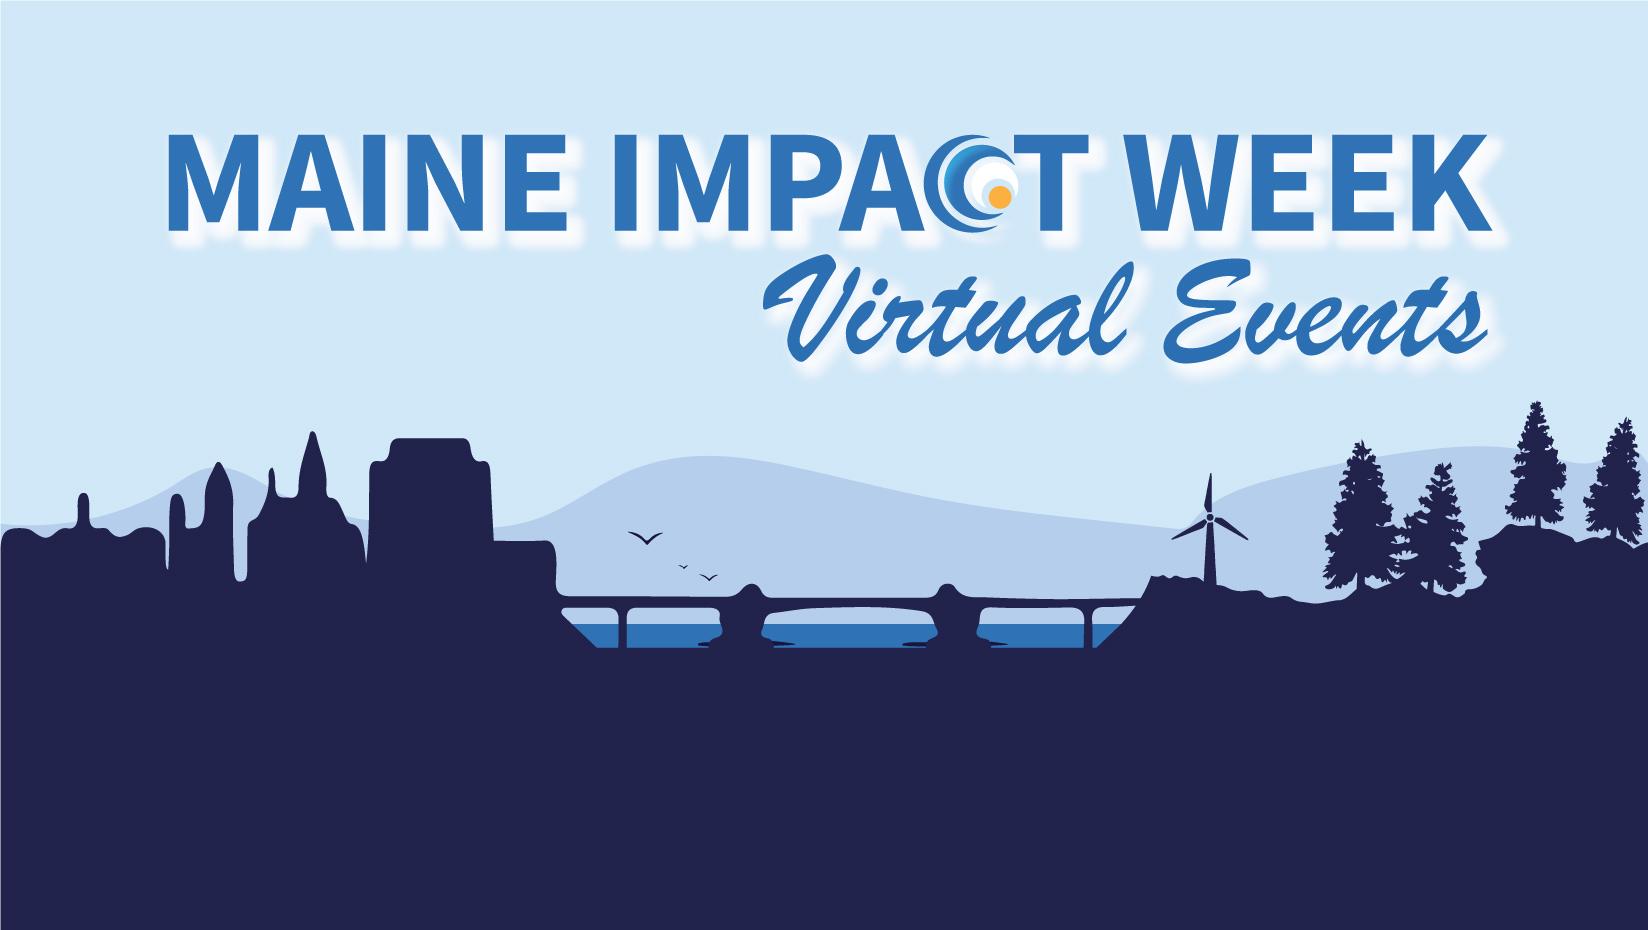 Maine Impact Week Virtual Events